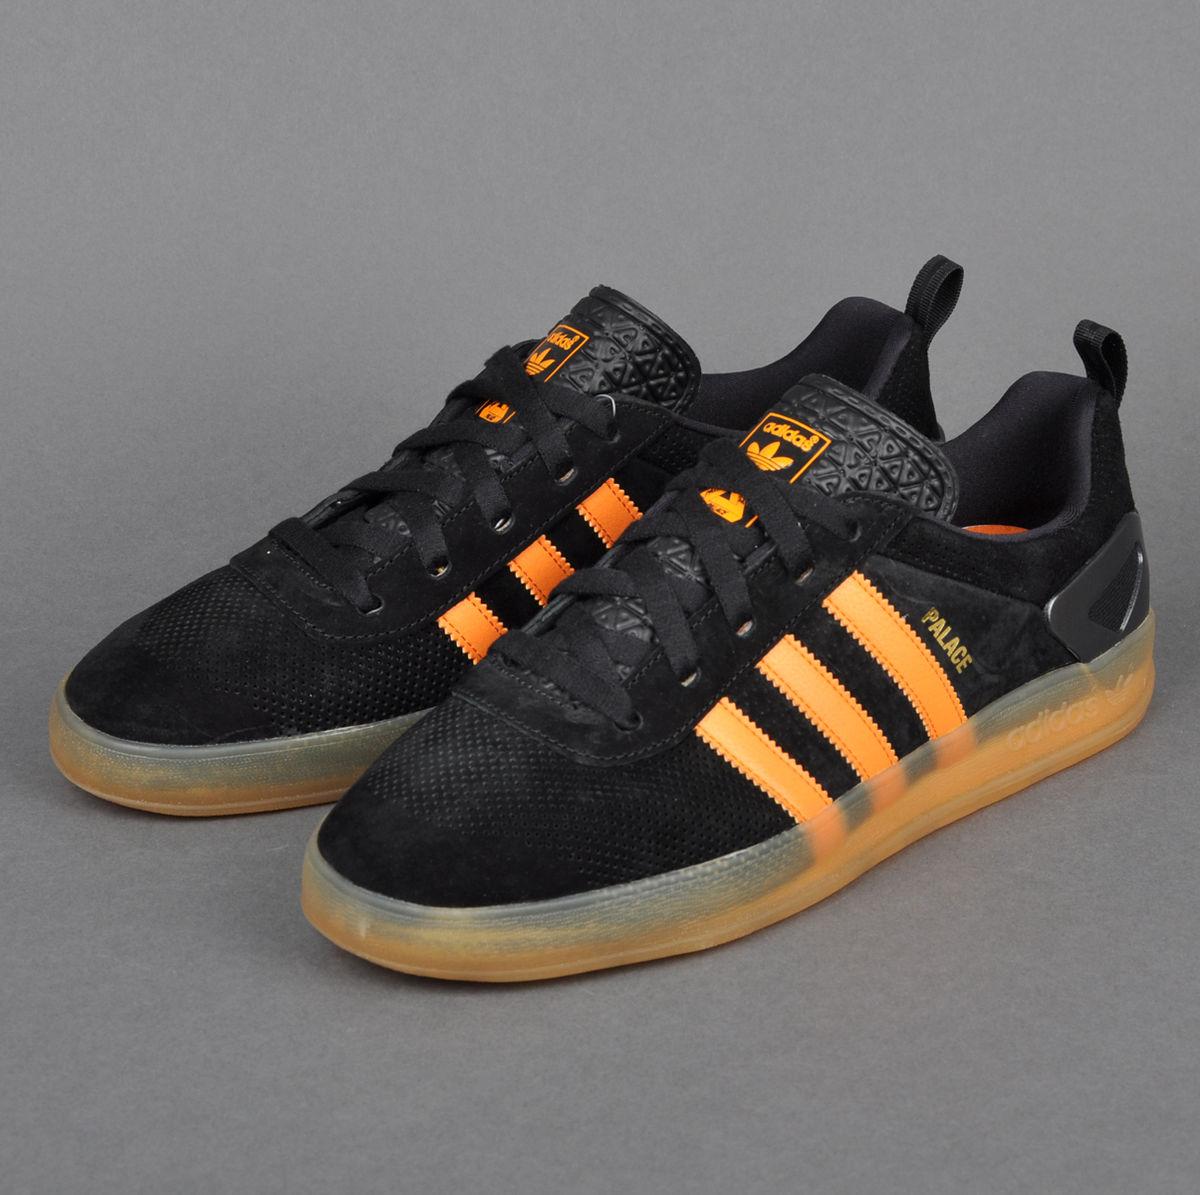 3bdb9112a17 Palace Adidas Palace Pro Black   Orange Size 9 - for Sale - Grailed